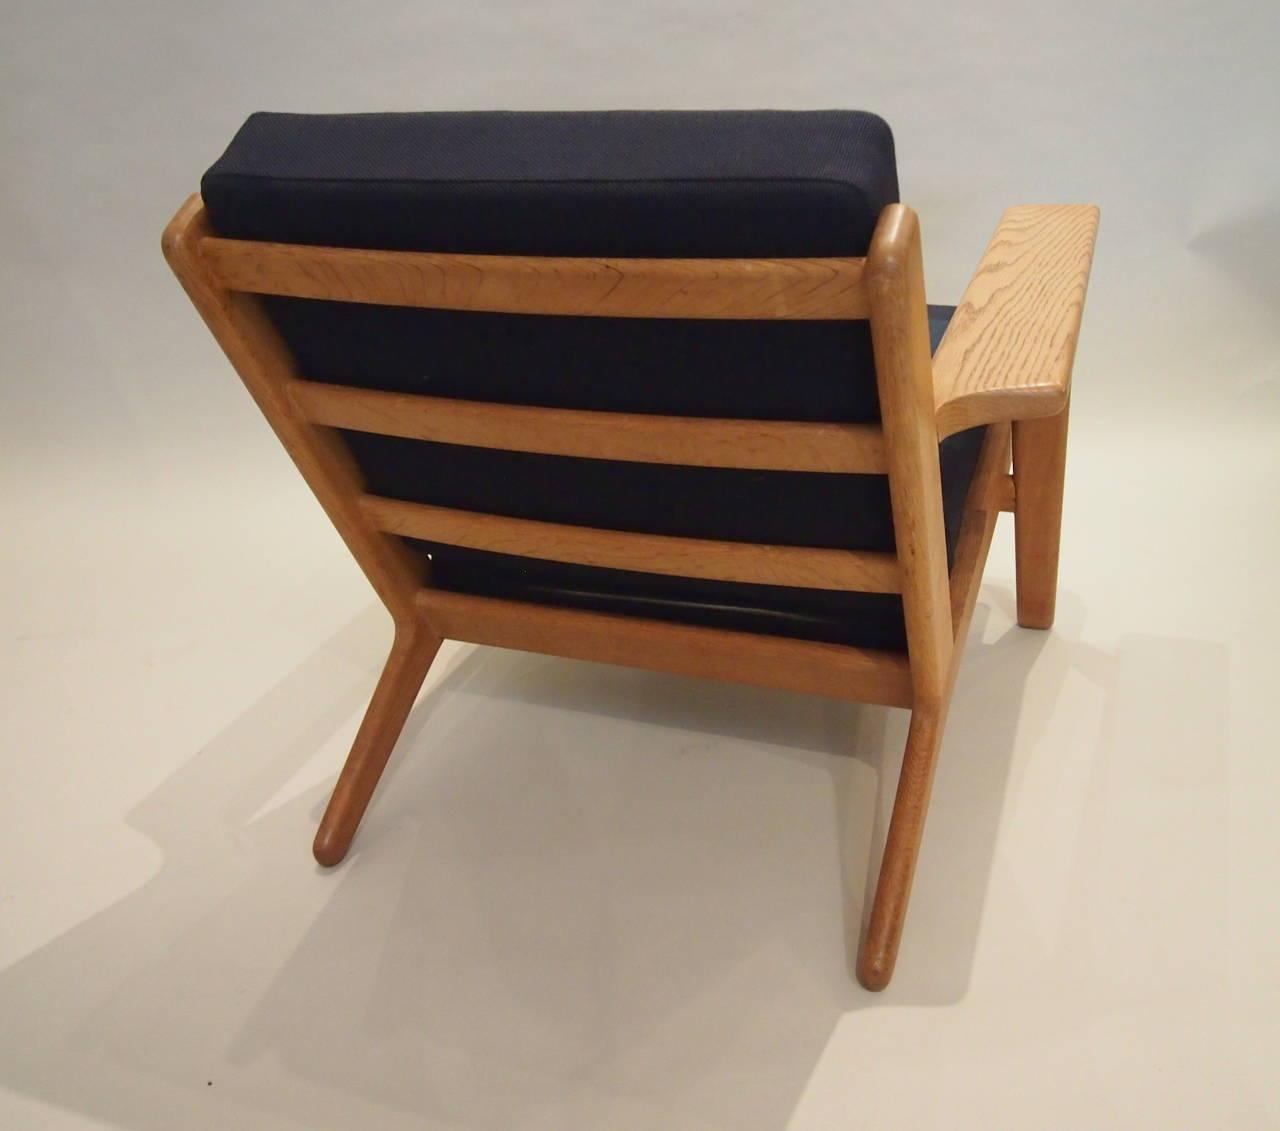 Pair Of Hans Wegner Plank Chairs G290 At 1stdibs